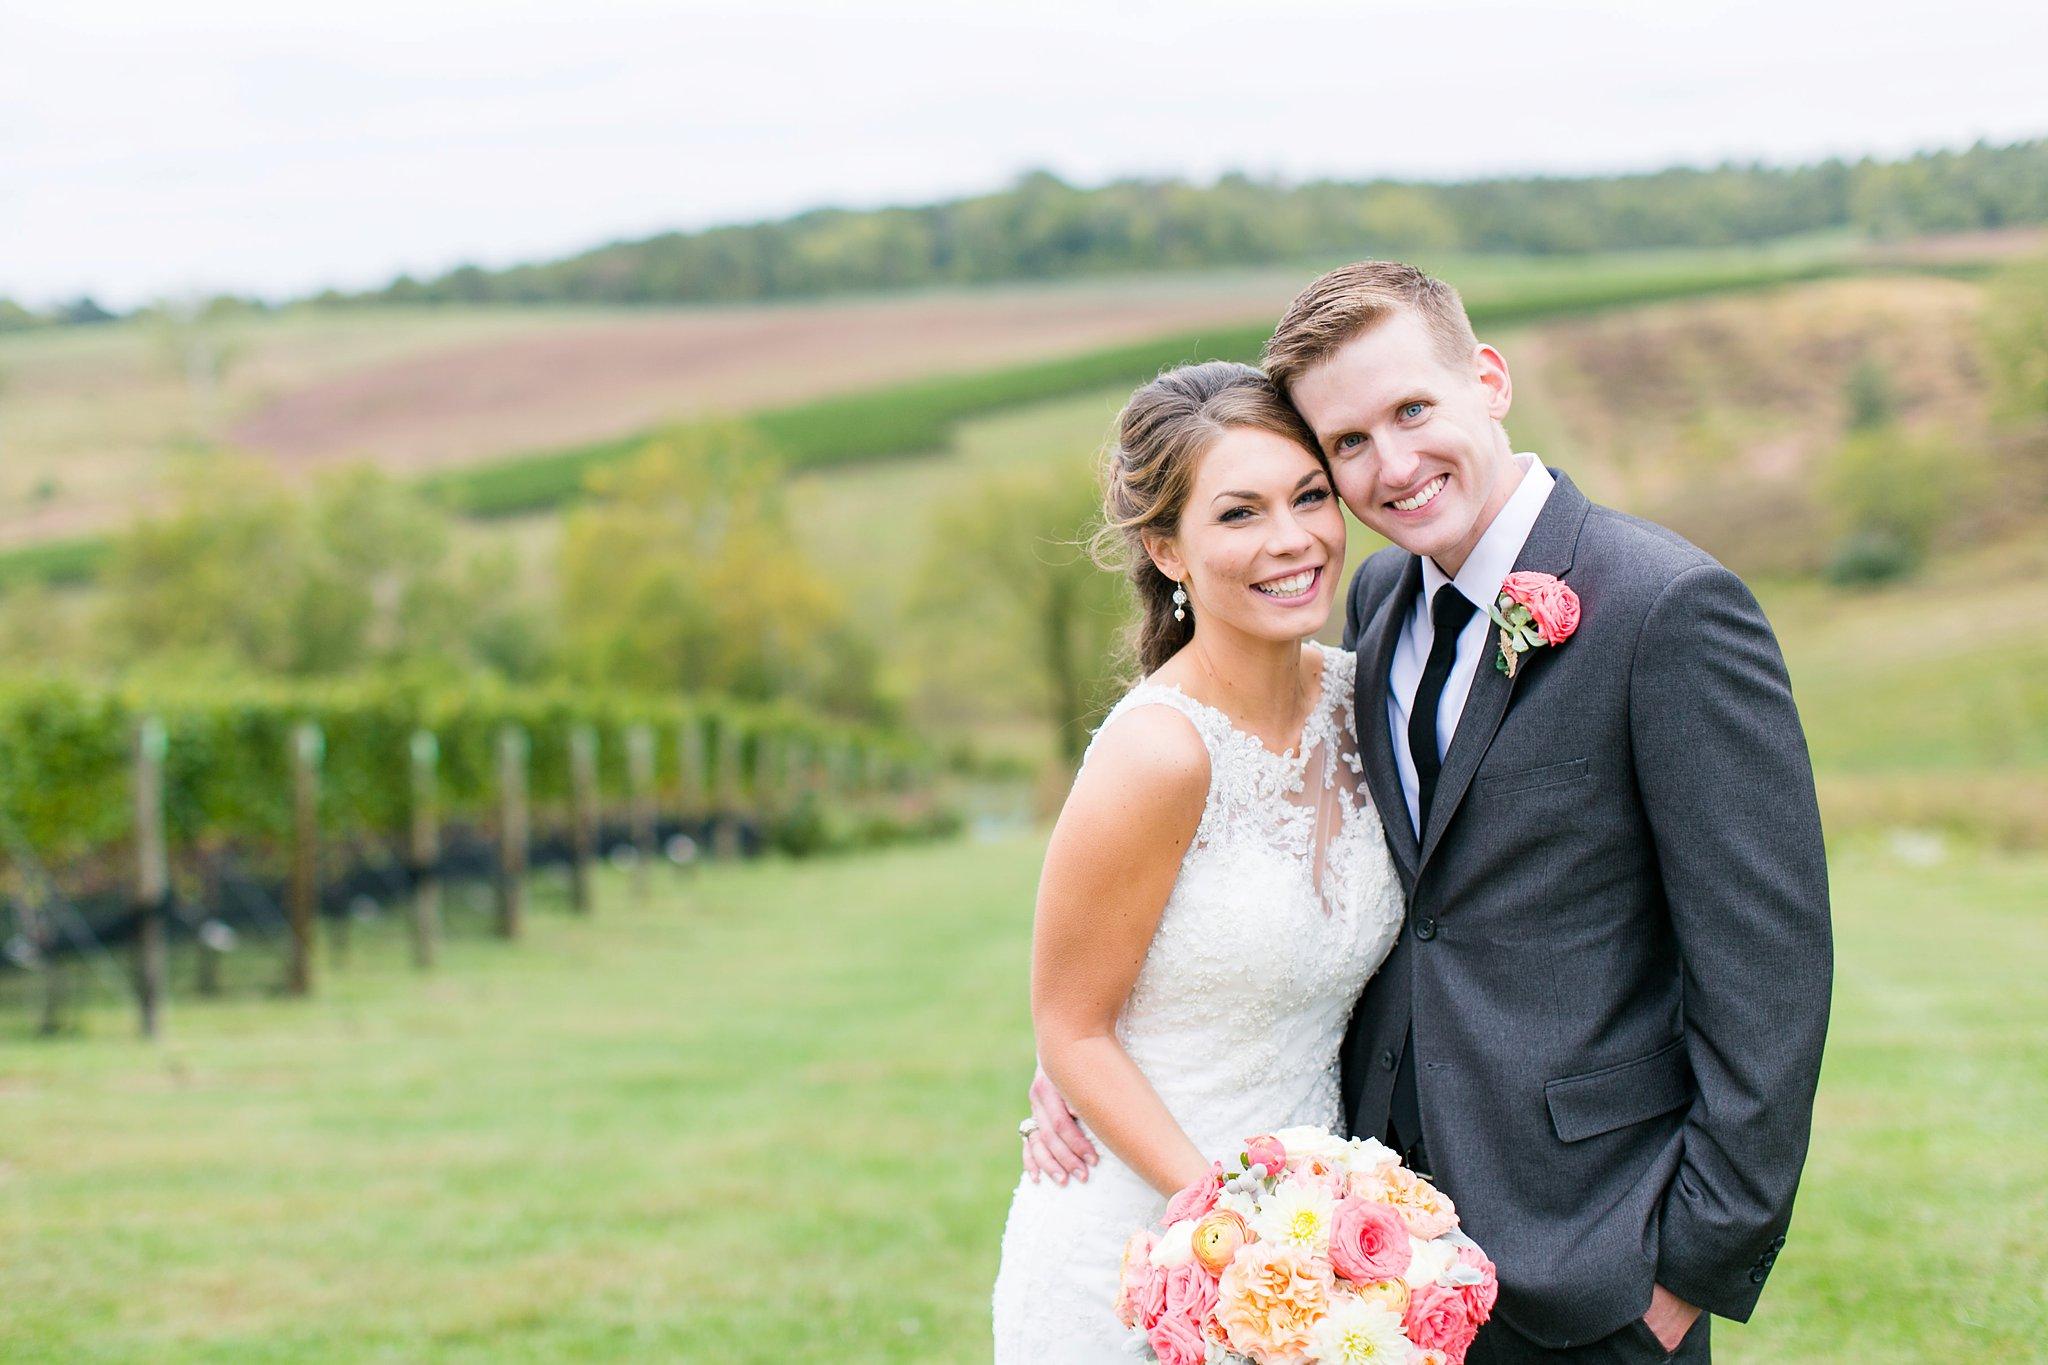 Stone Tower Winery Wedding Photos Virginia Wedding Photographer Megan Kelsey Photography Sam & Angela-225.jpg